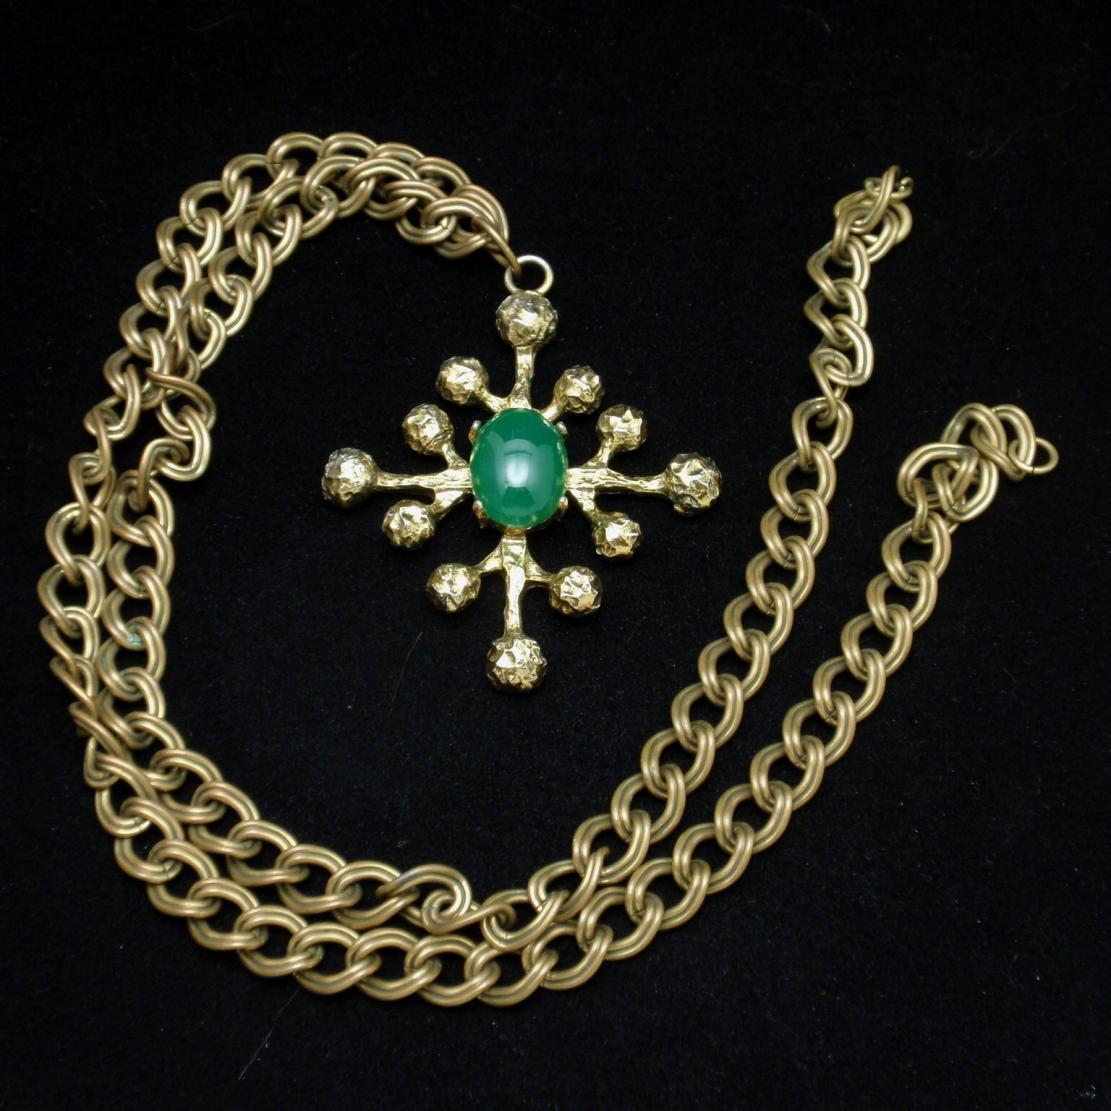 Modernist Pendant on Heavy Necklace Chain Vintage Zentall